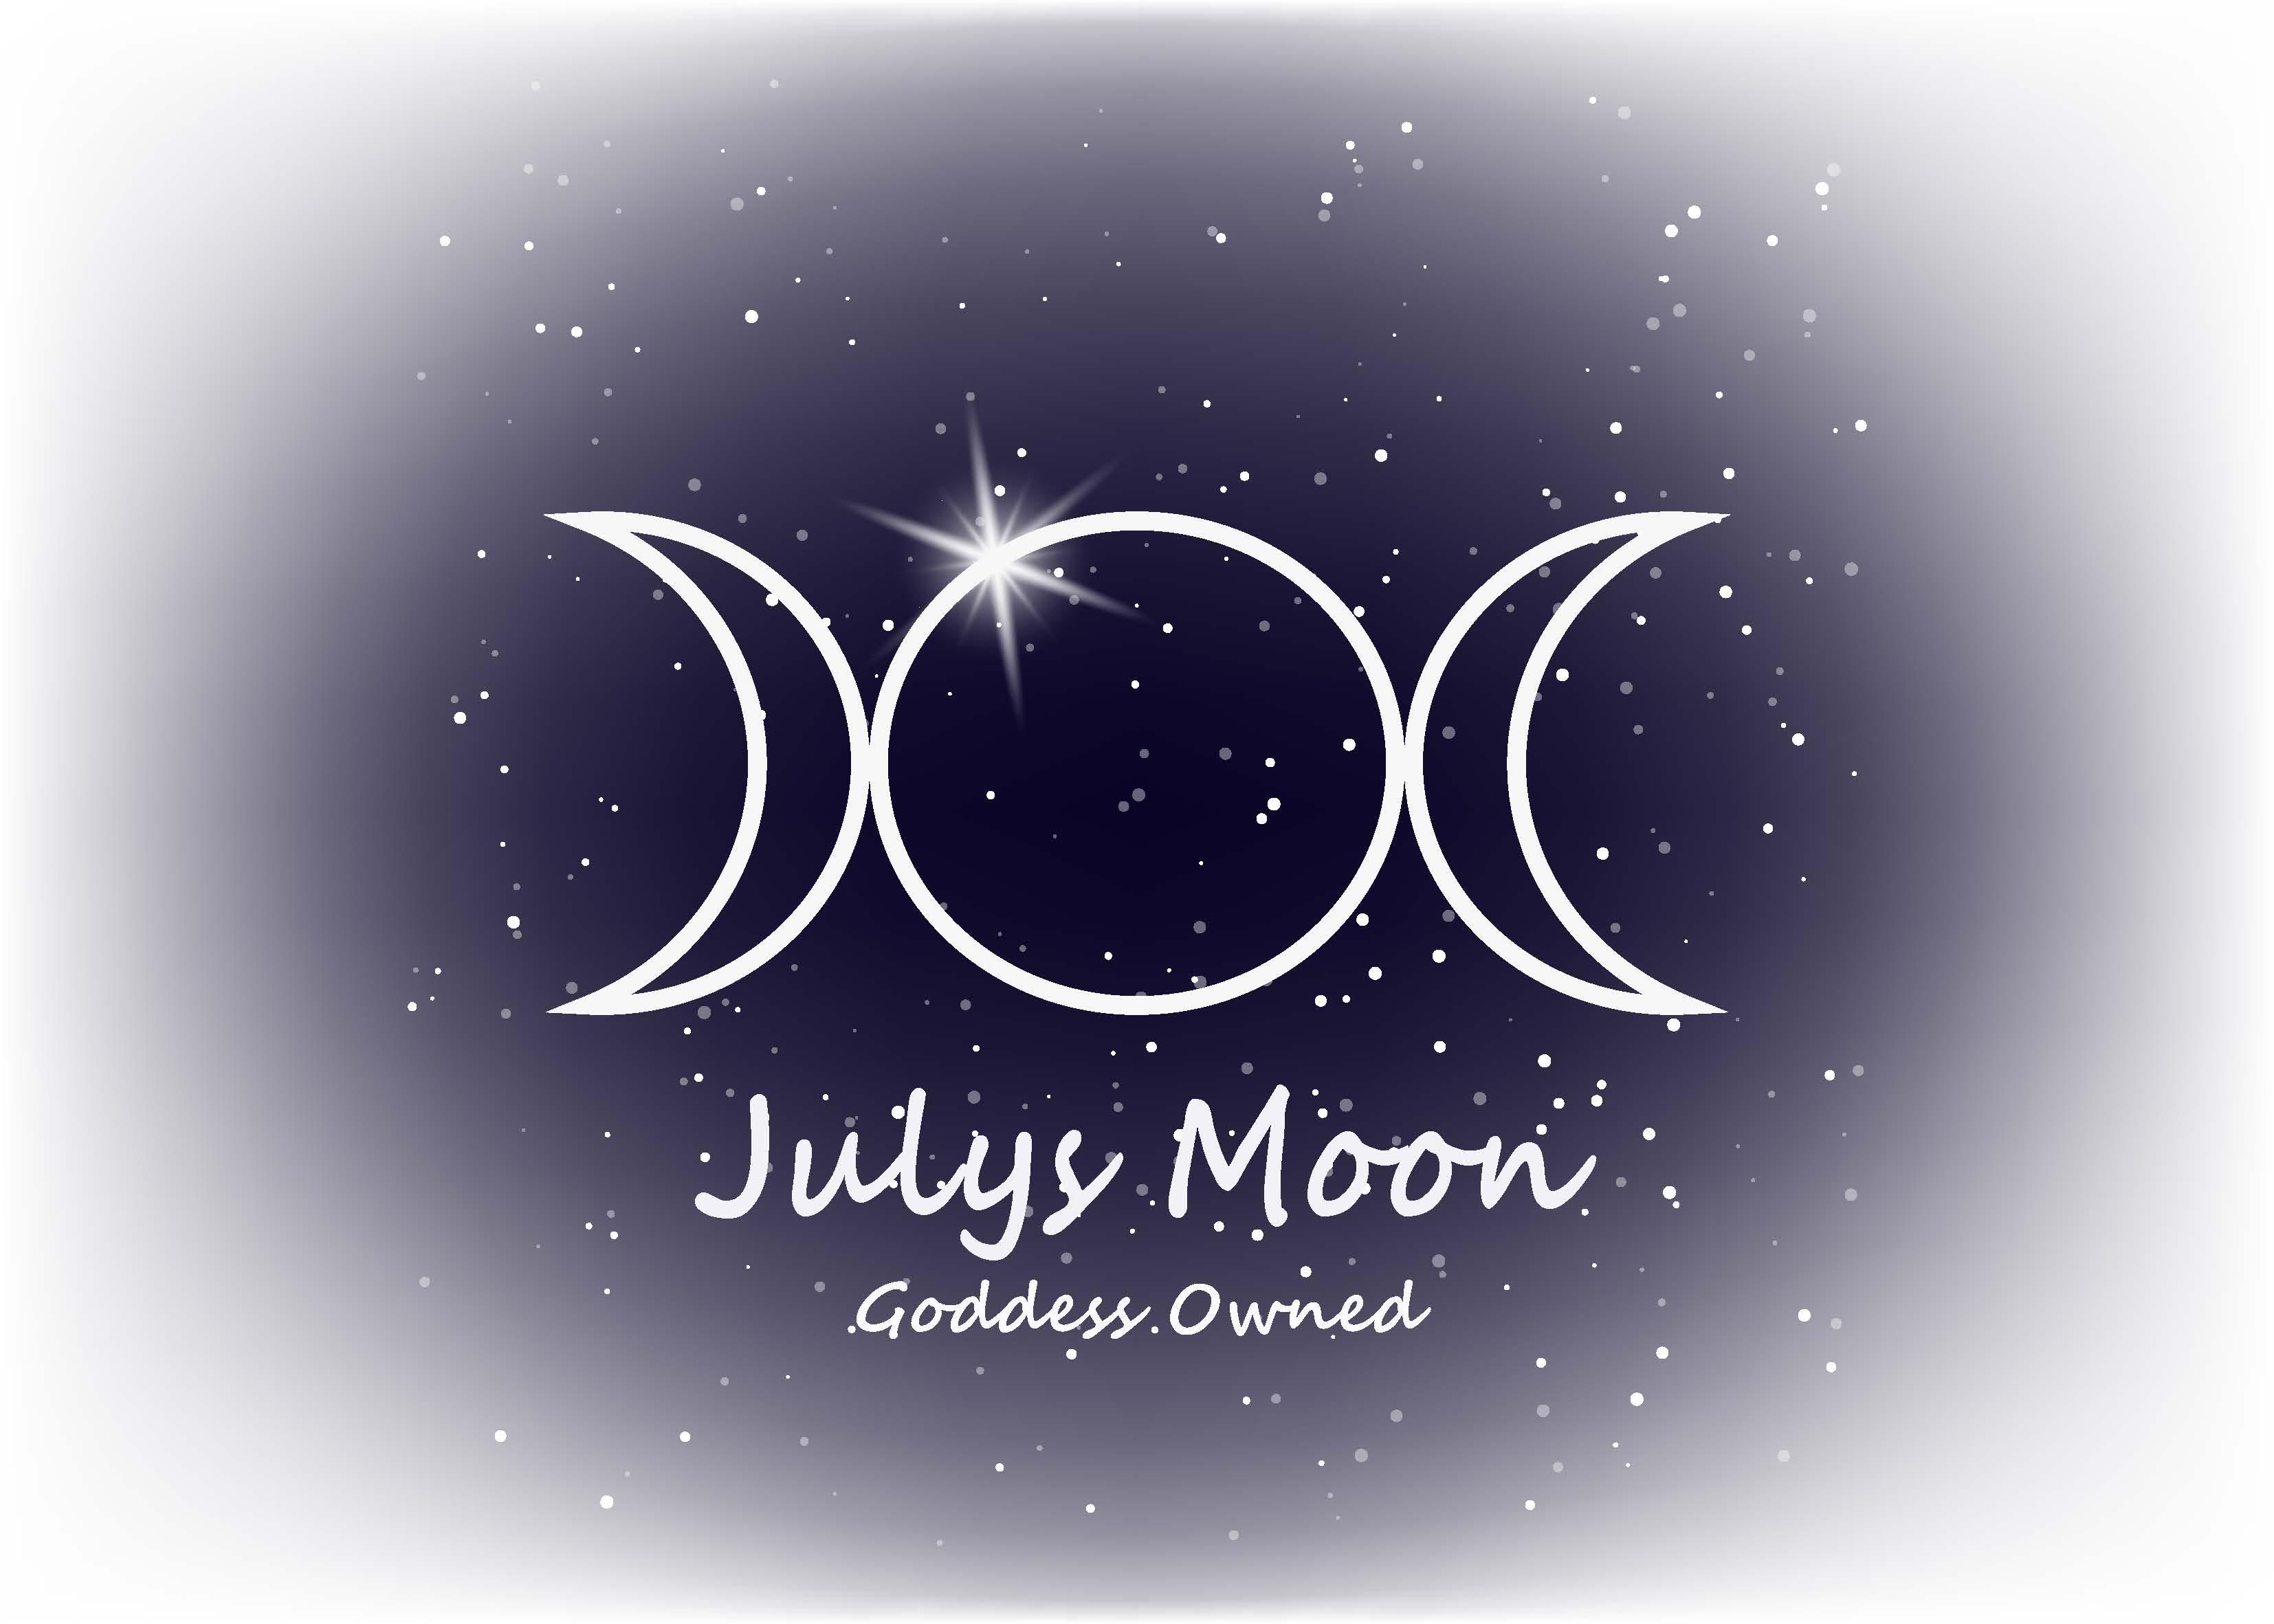 July's Moon LLC